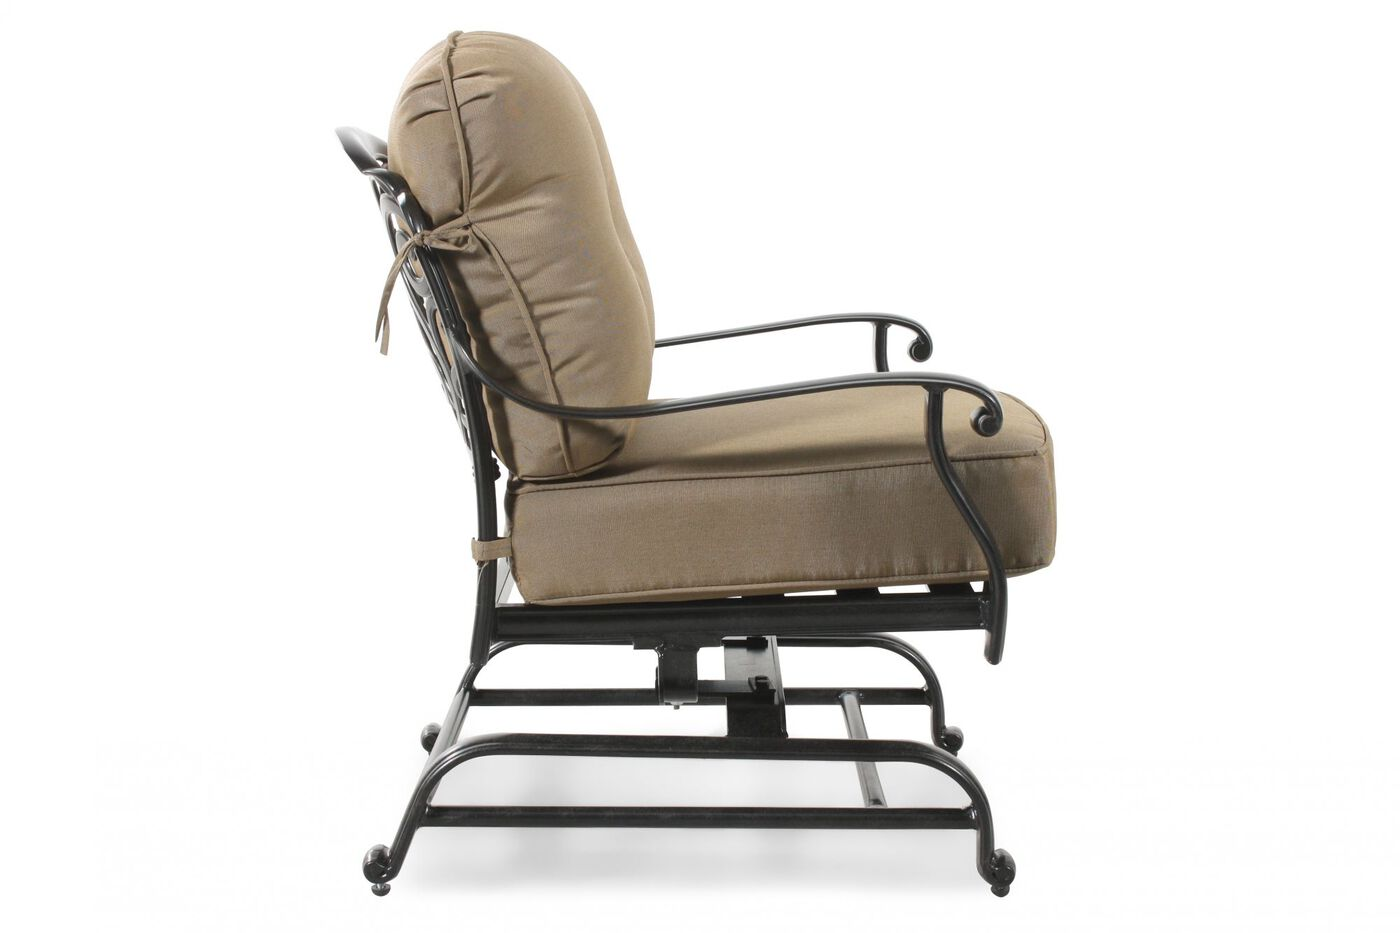 Button Tufted Aluminum Rocker Chair With Cushion In Khaki